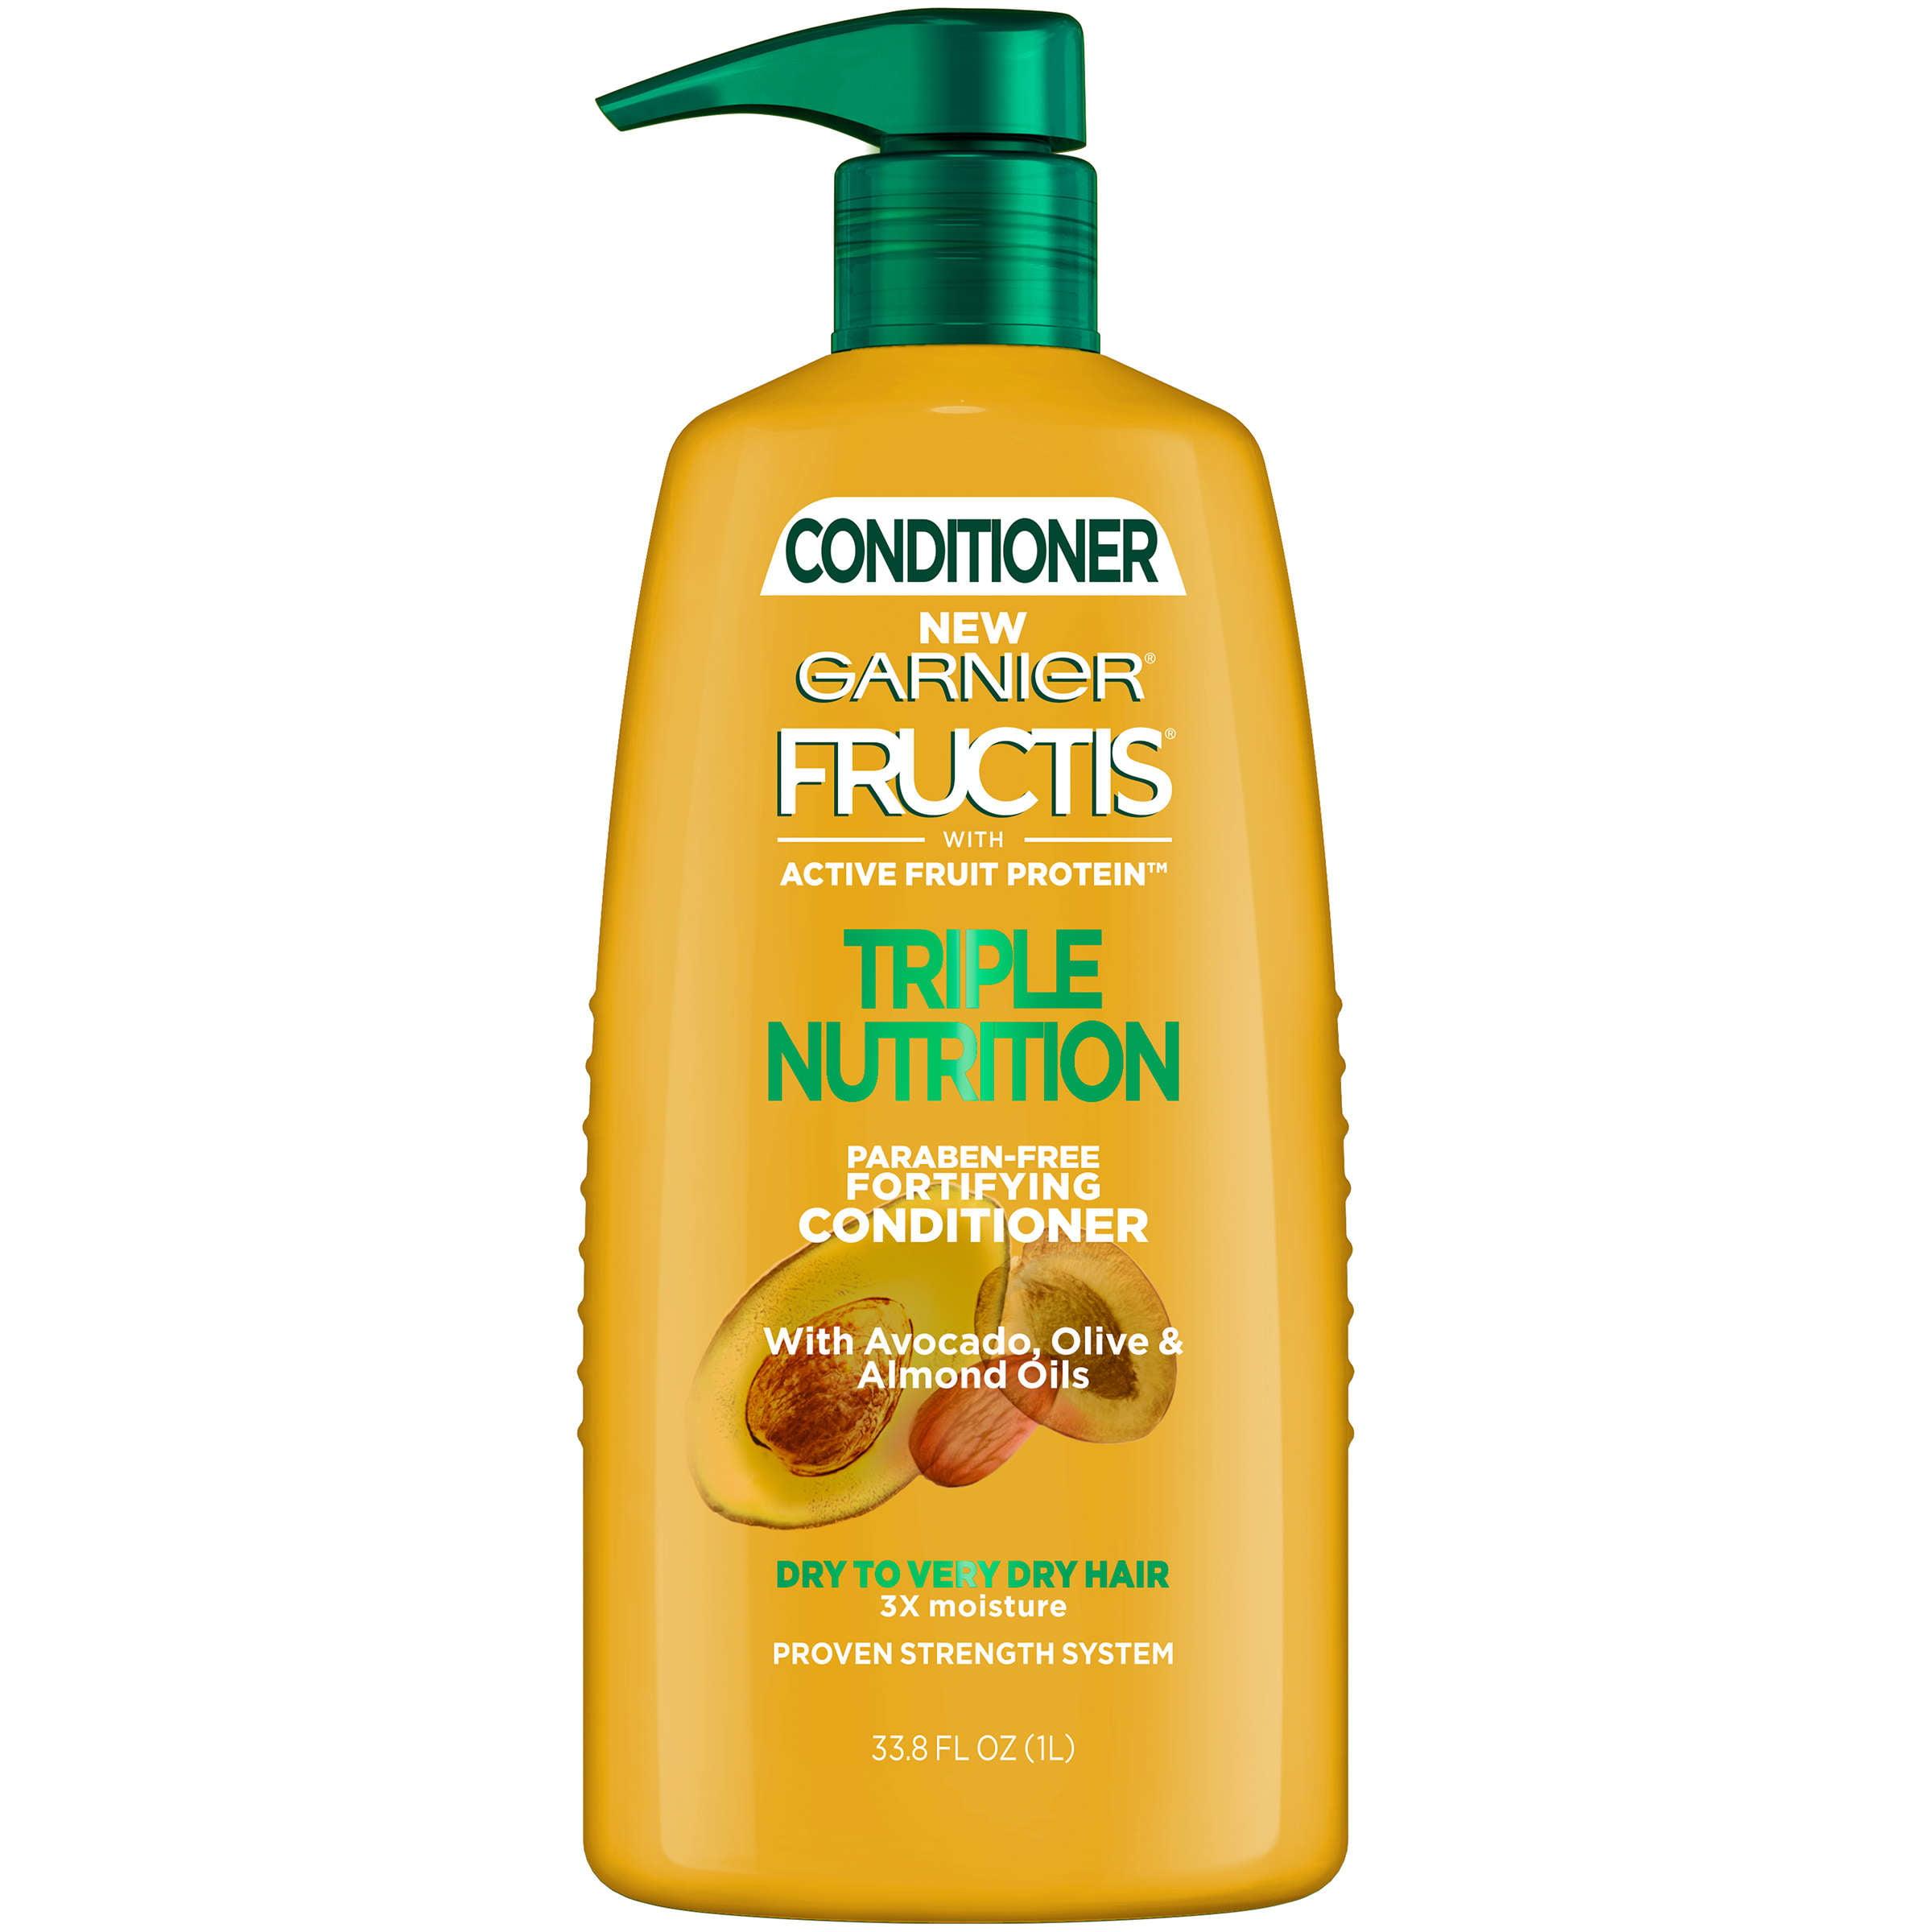 Garnier Fructis Triple Nutrition Conditioner 33.8 FL OZ